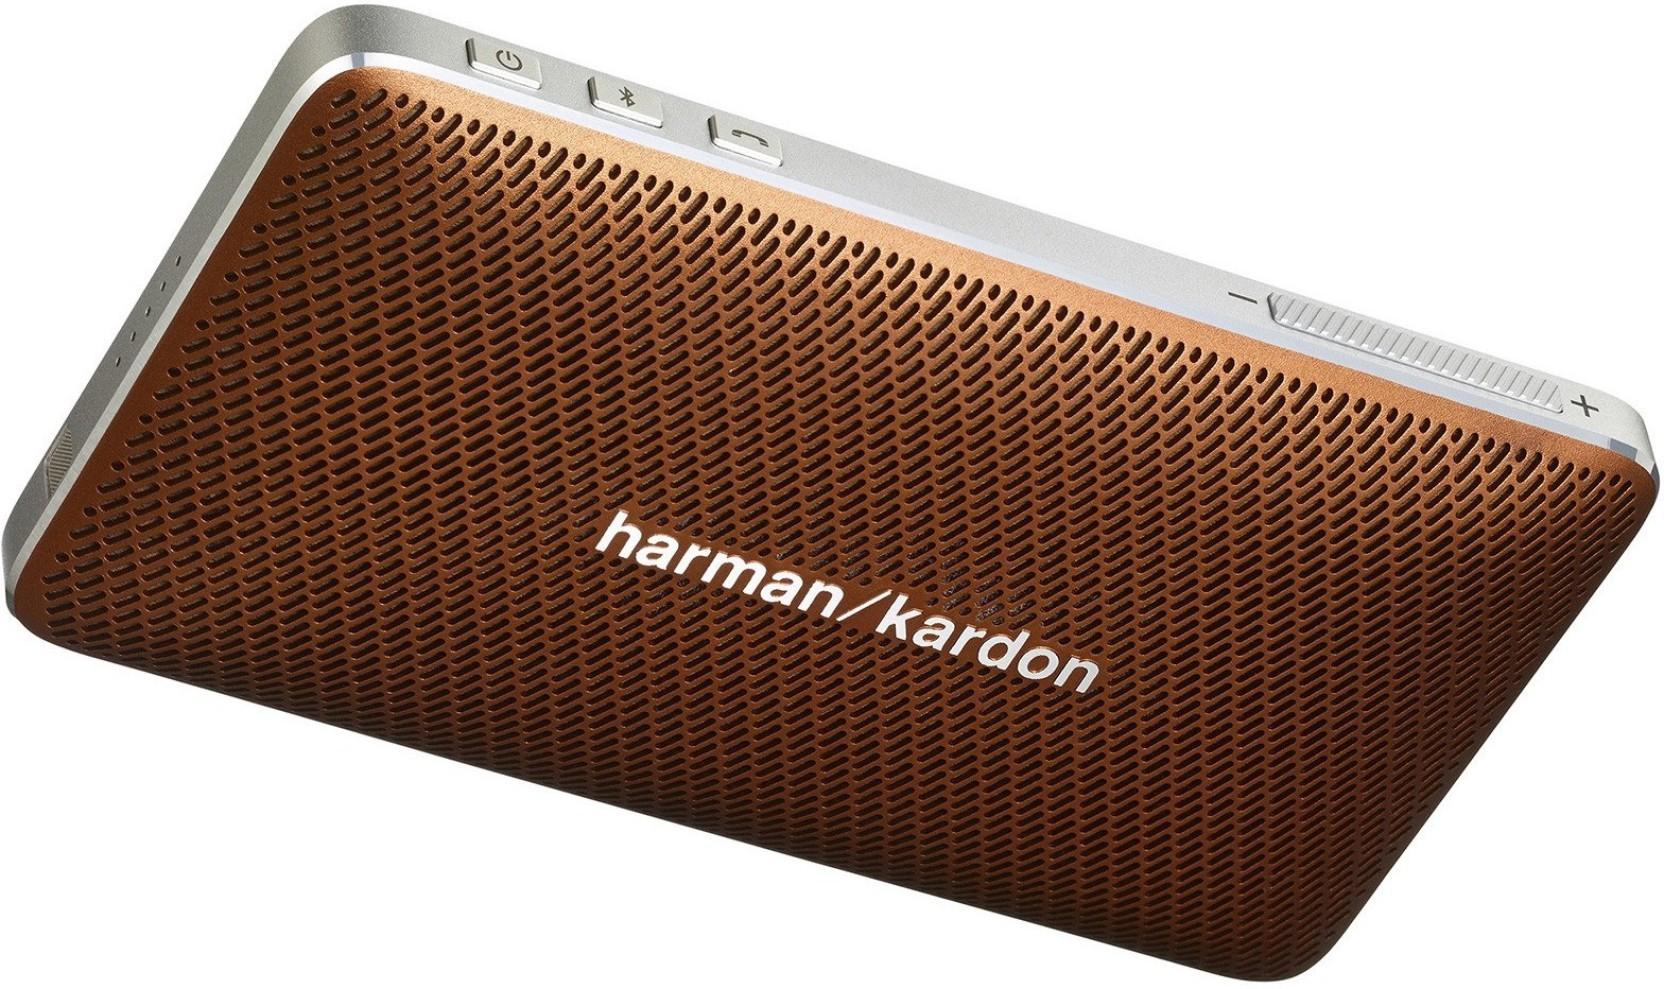 Buy Harman Kardon Esquire Mini 8 W Portable Bluetooth Speaker Online Onyx Studio 1 International Warranty Add To Cart